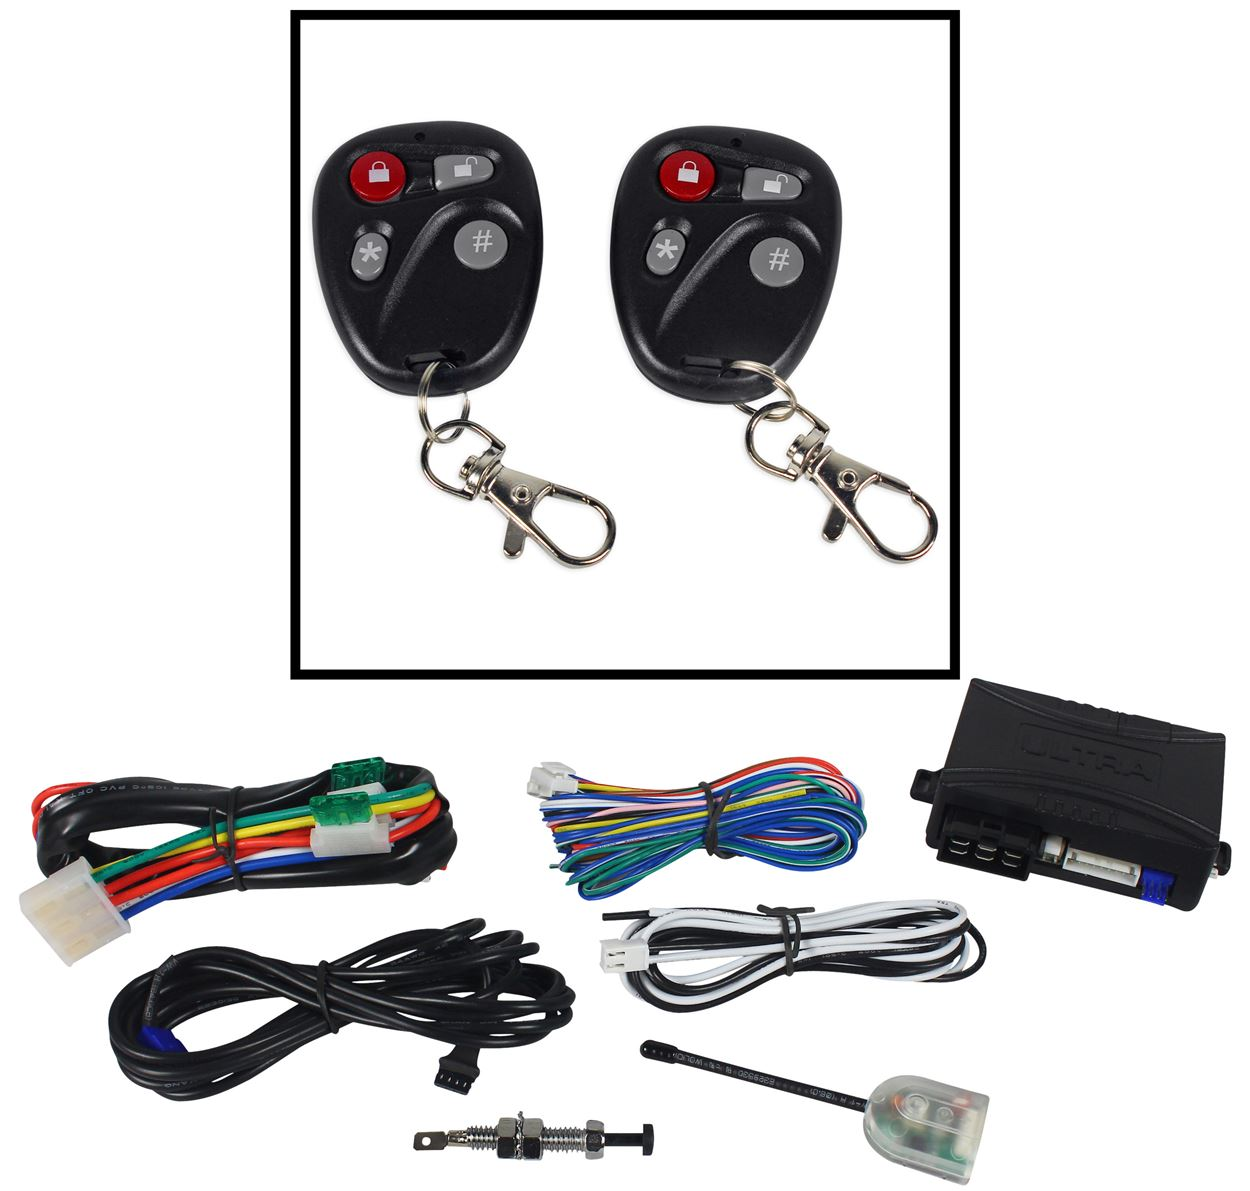 Ultrastart U1272-DP Remote Starter Car Start System w Keyless Entry (2) Remotes by ULTRASTART